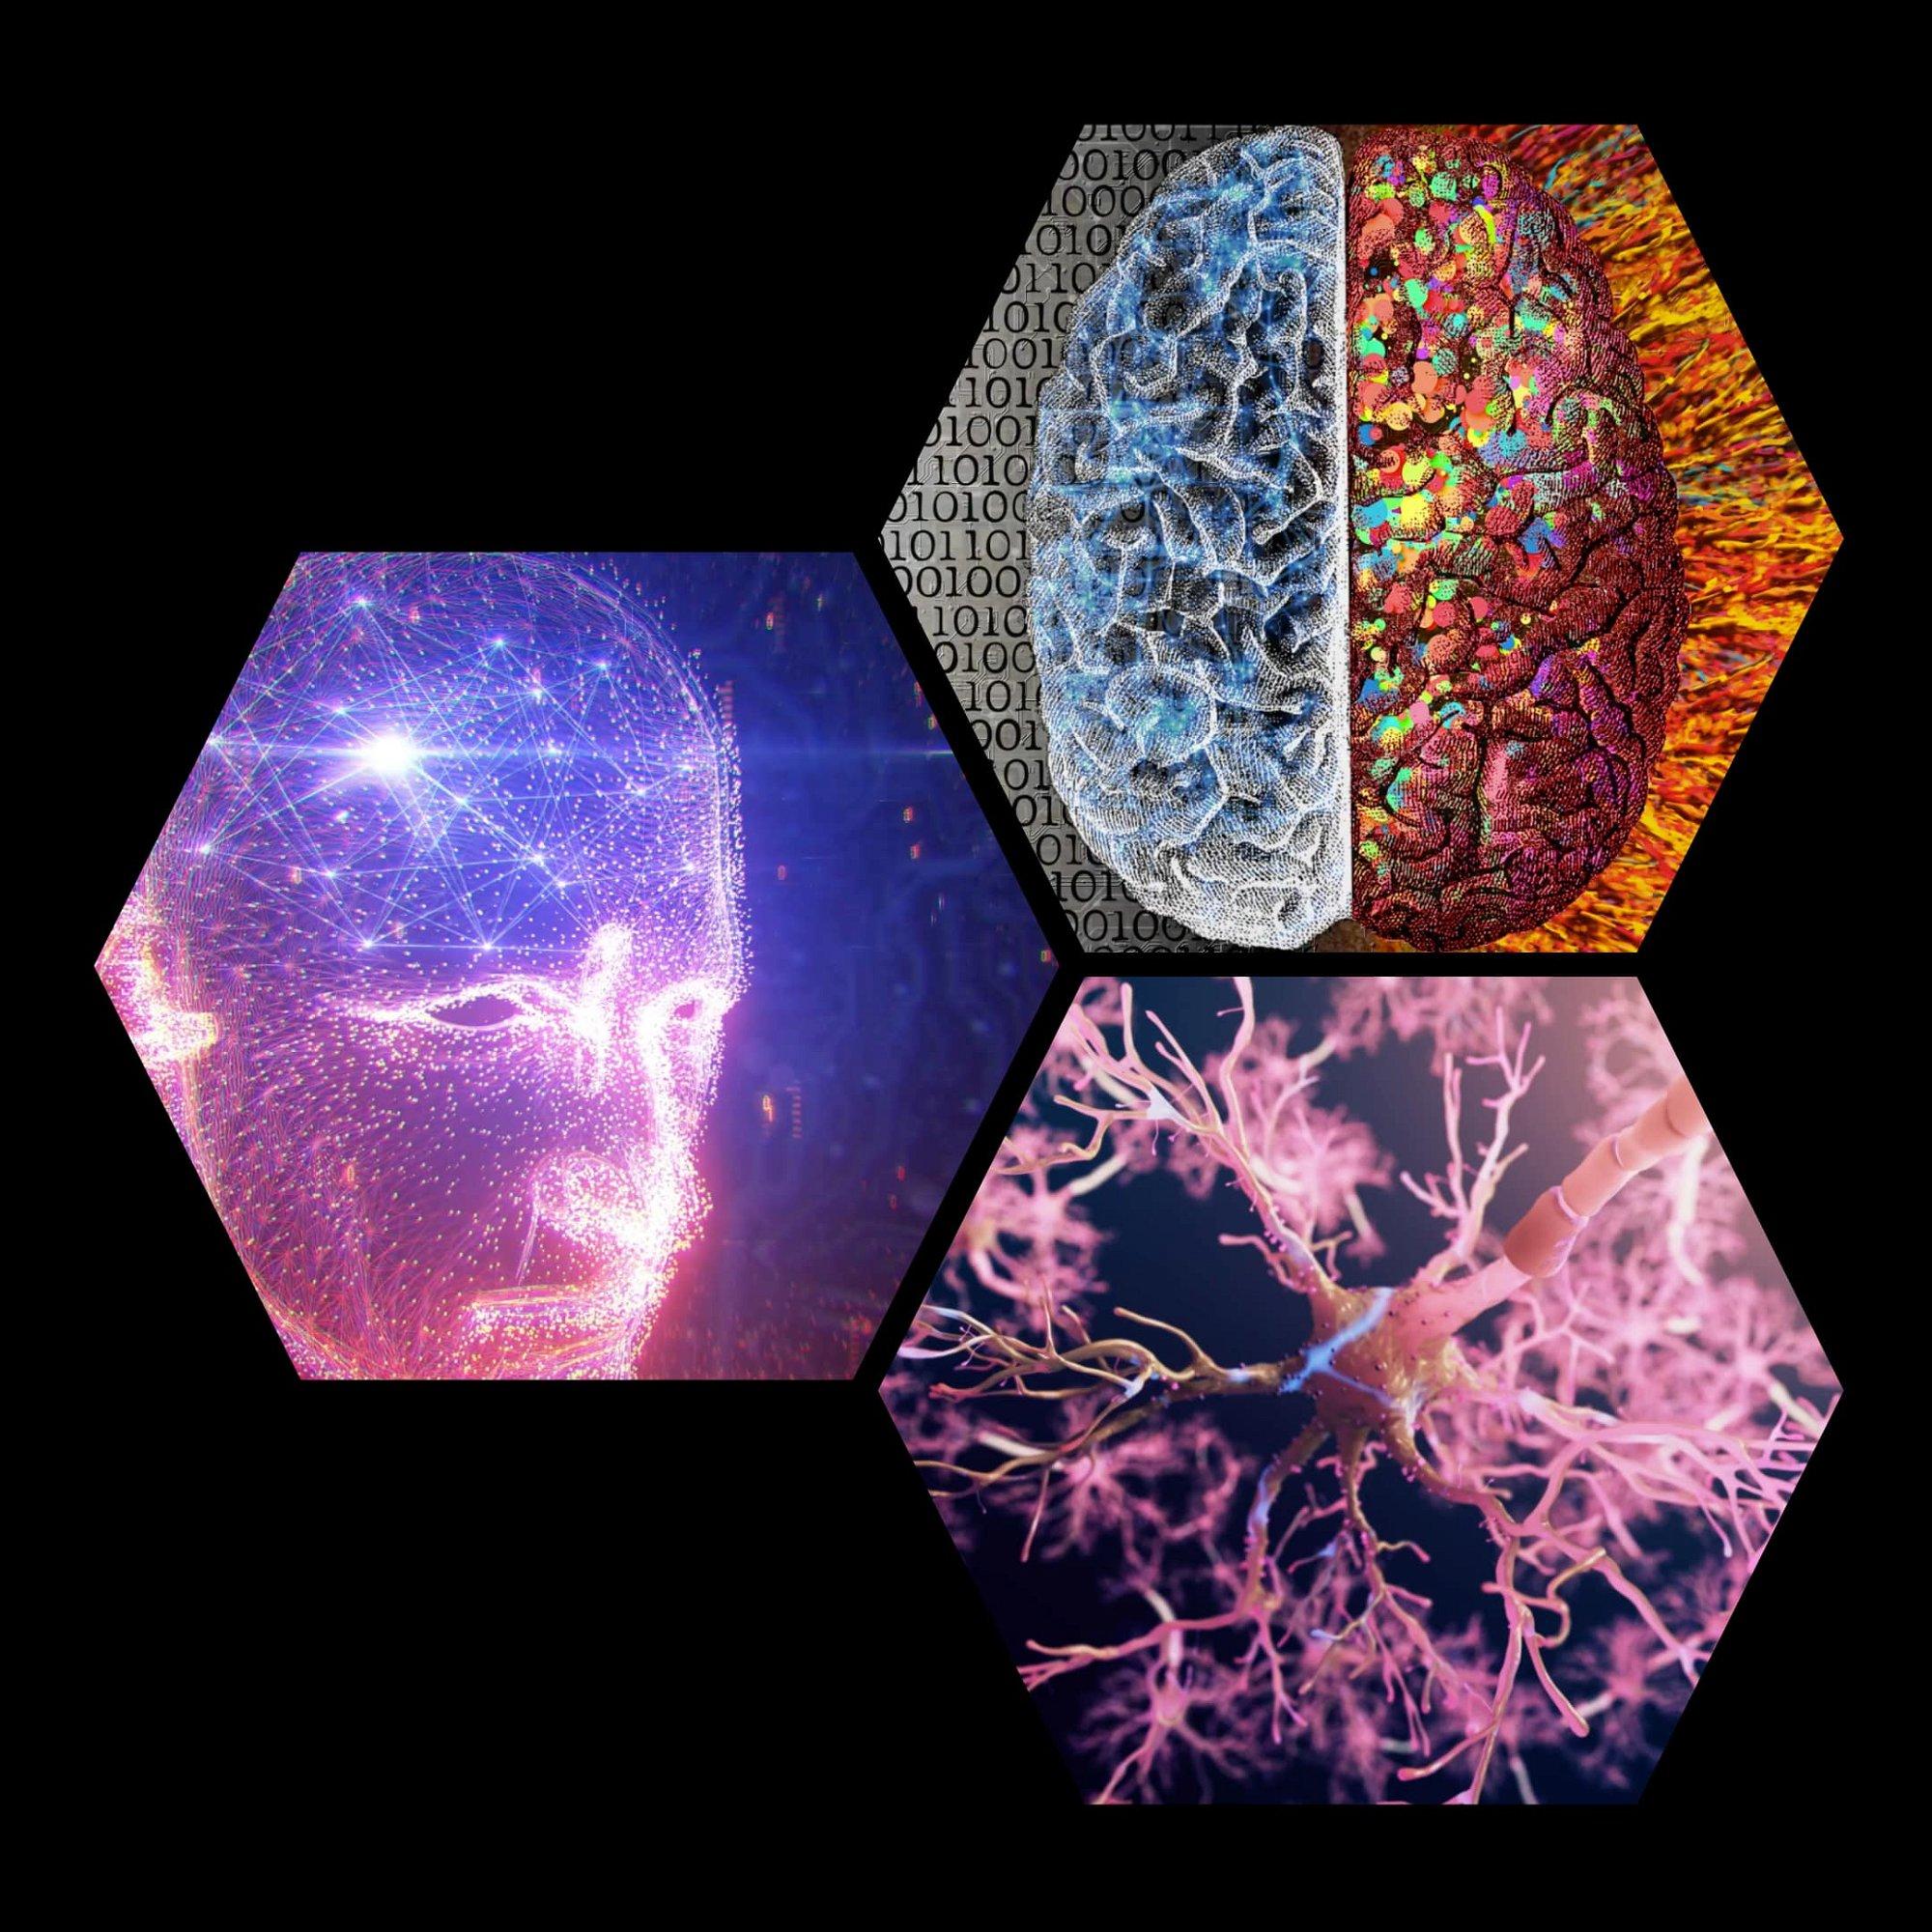 lion's mane nootropic mushroom brain booster neurone brain cells